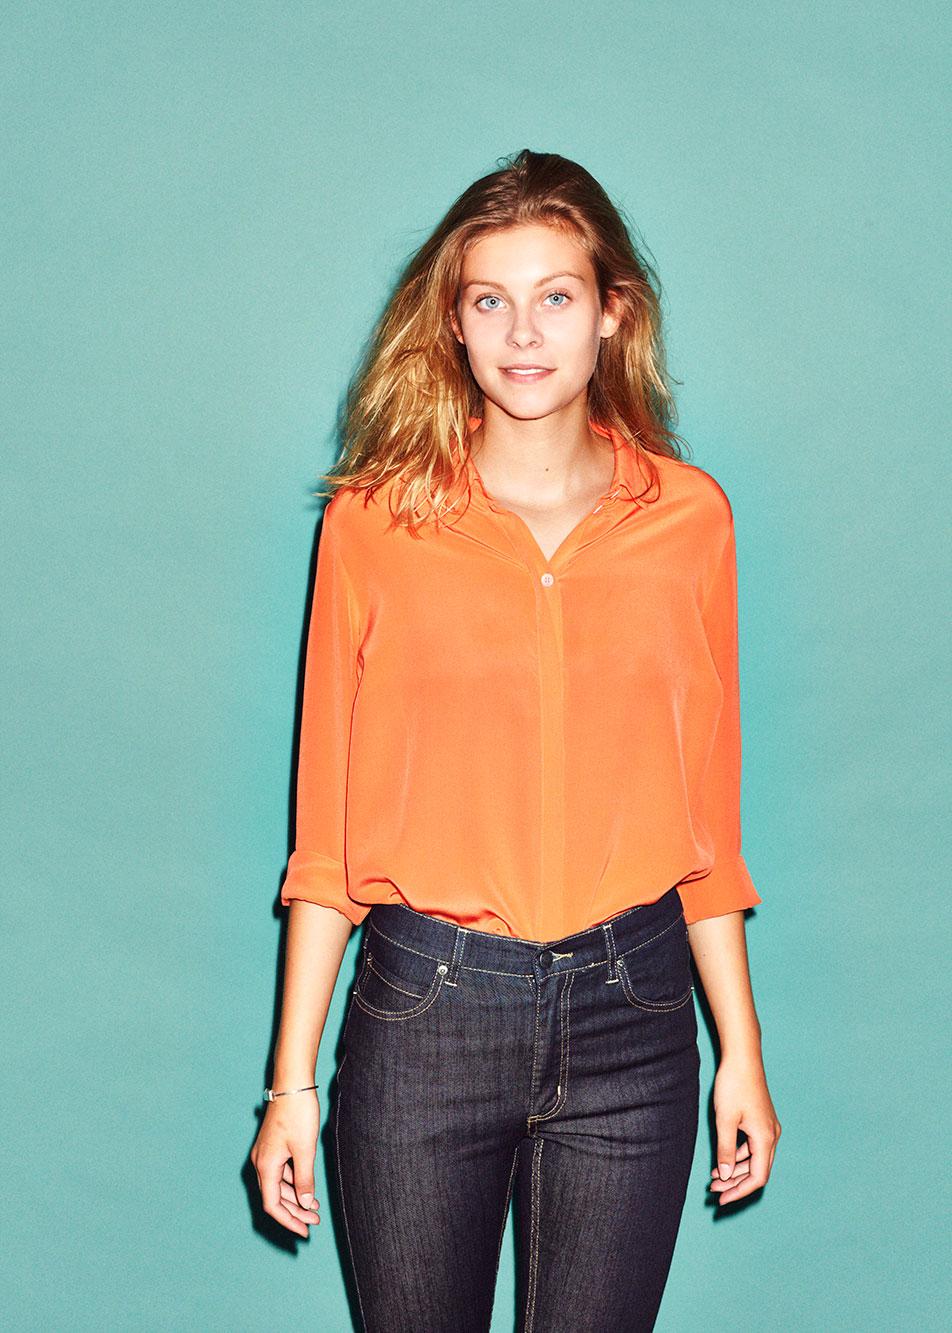 Lea, 2013 Fashion Patrick Desbrosses